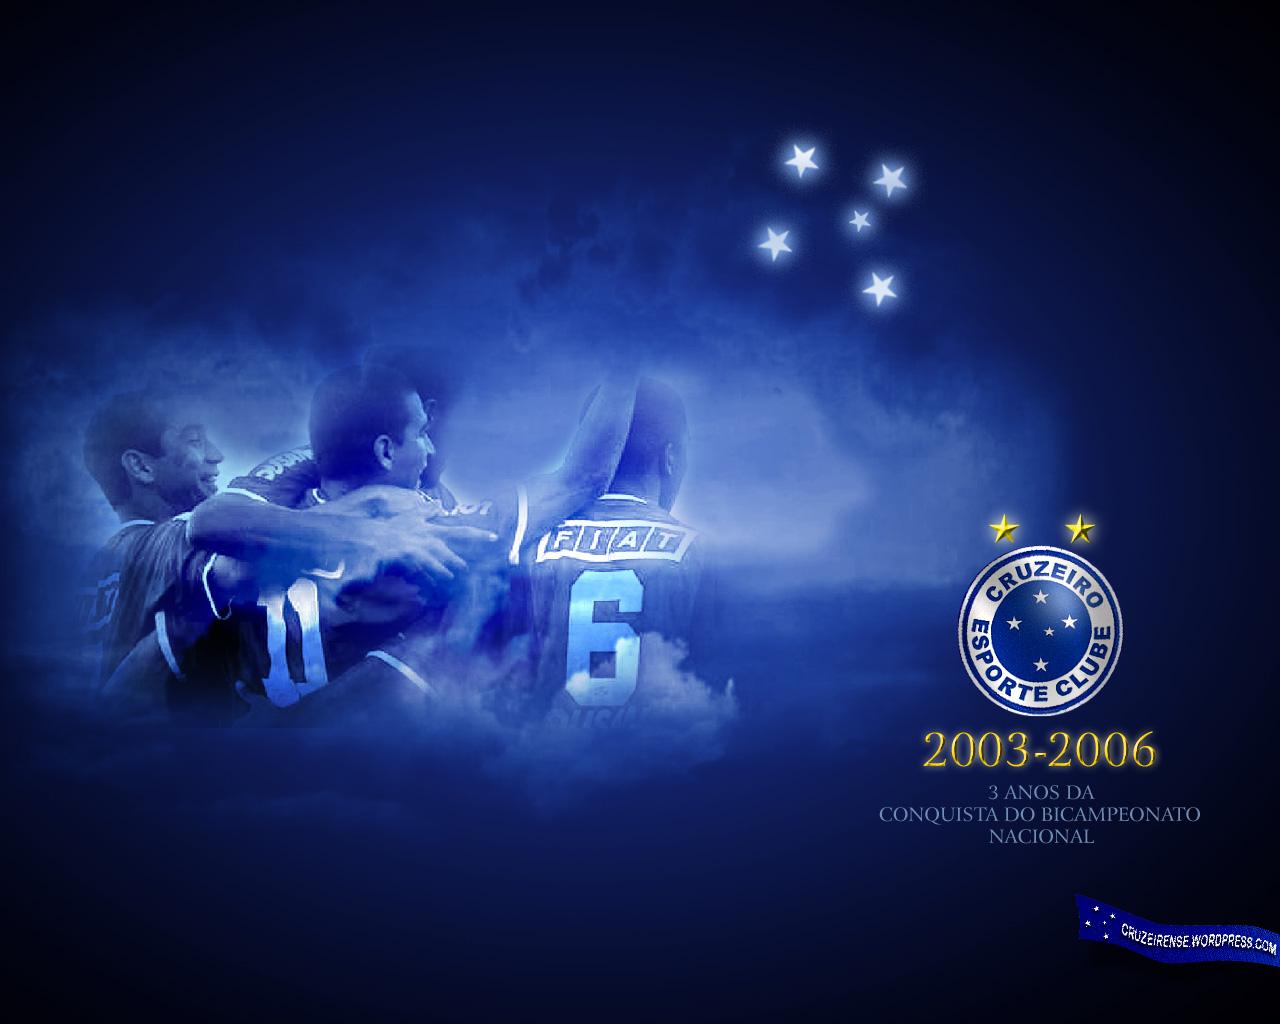 Papel De Parede Do Cruzeiro Wallpaper